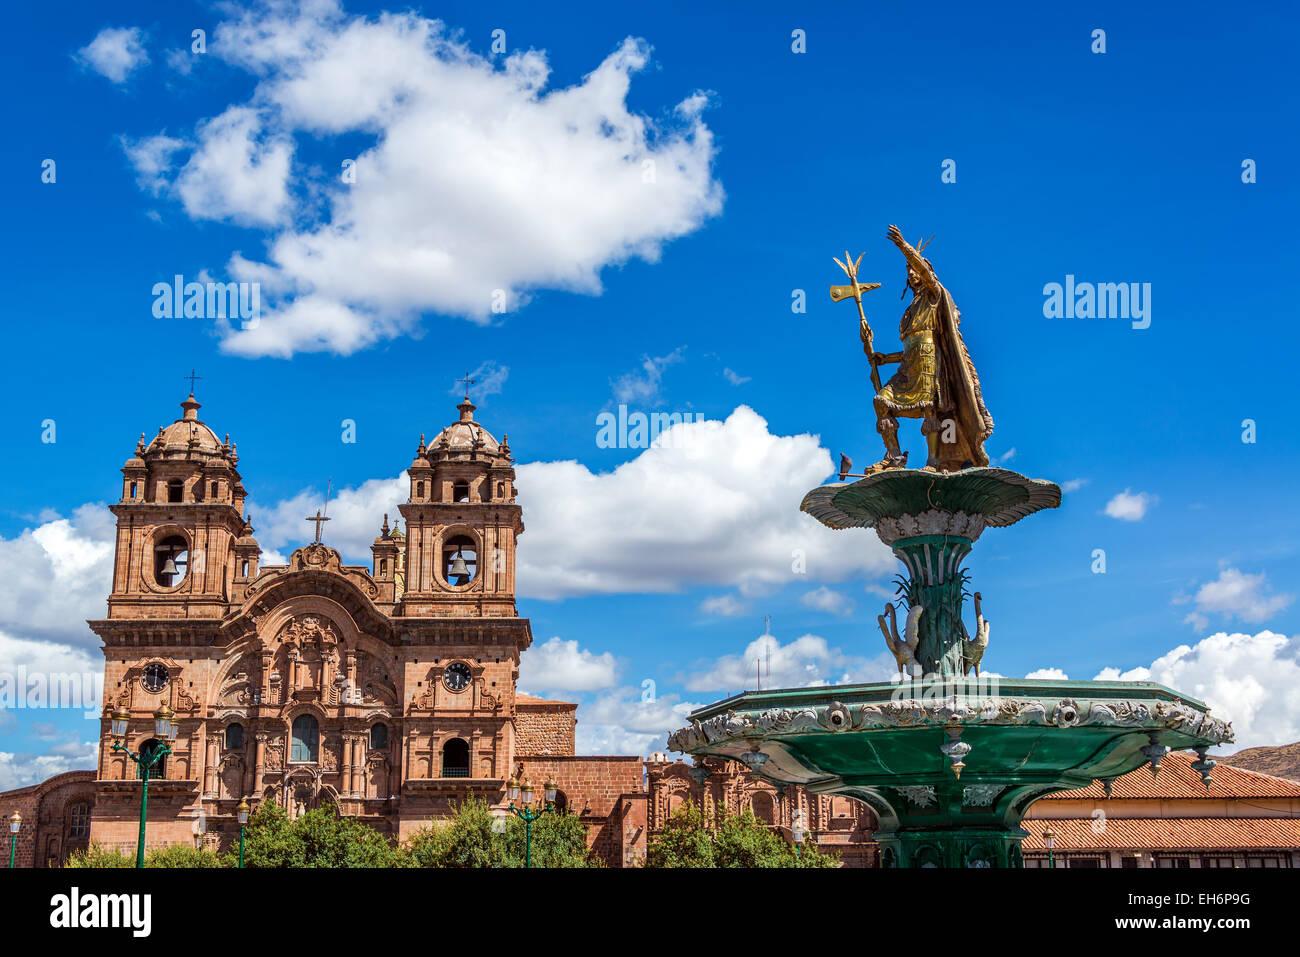 Church and Incan fountain in the Plaza de Armas of Cusco, Peru - Stock Image